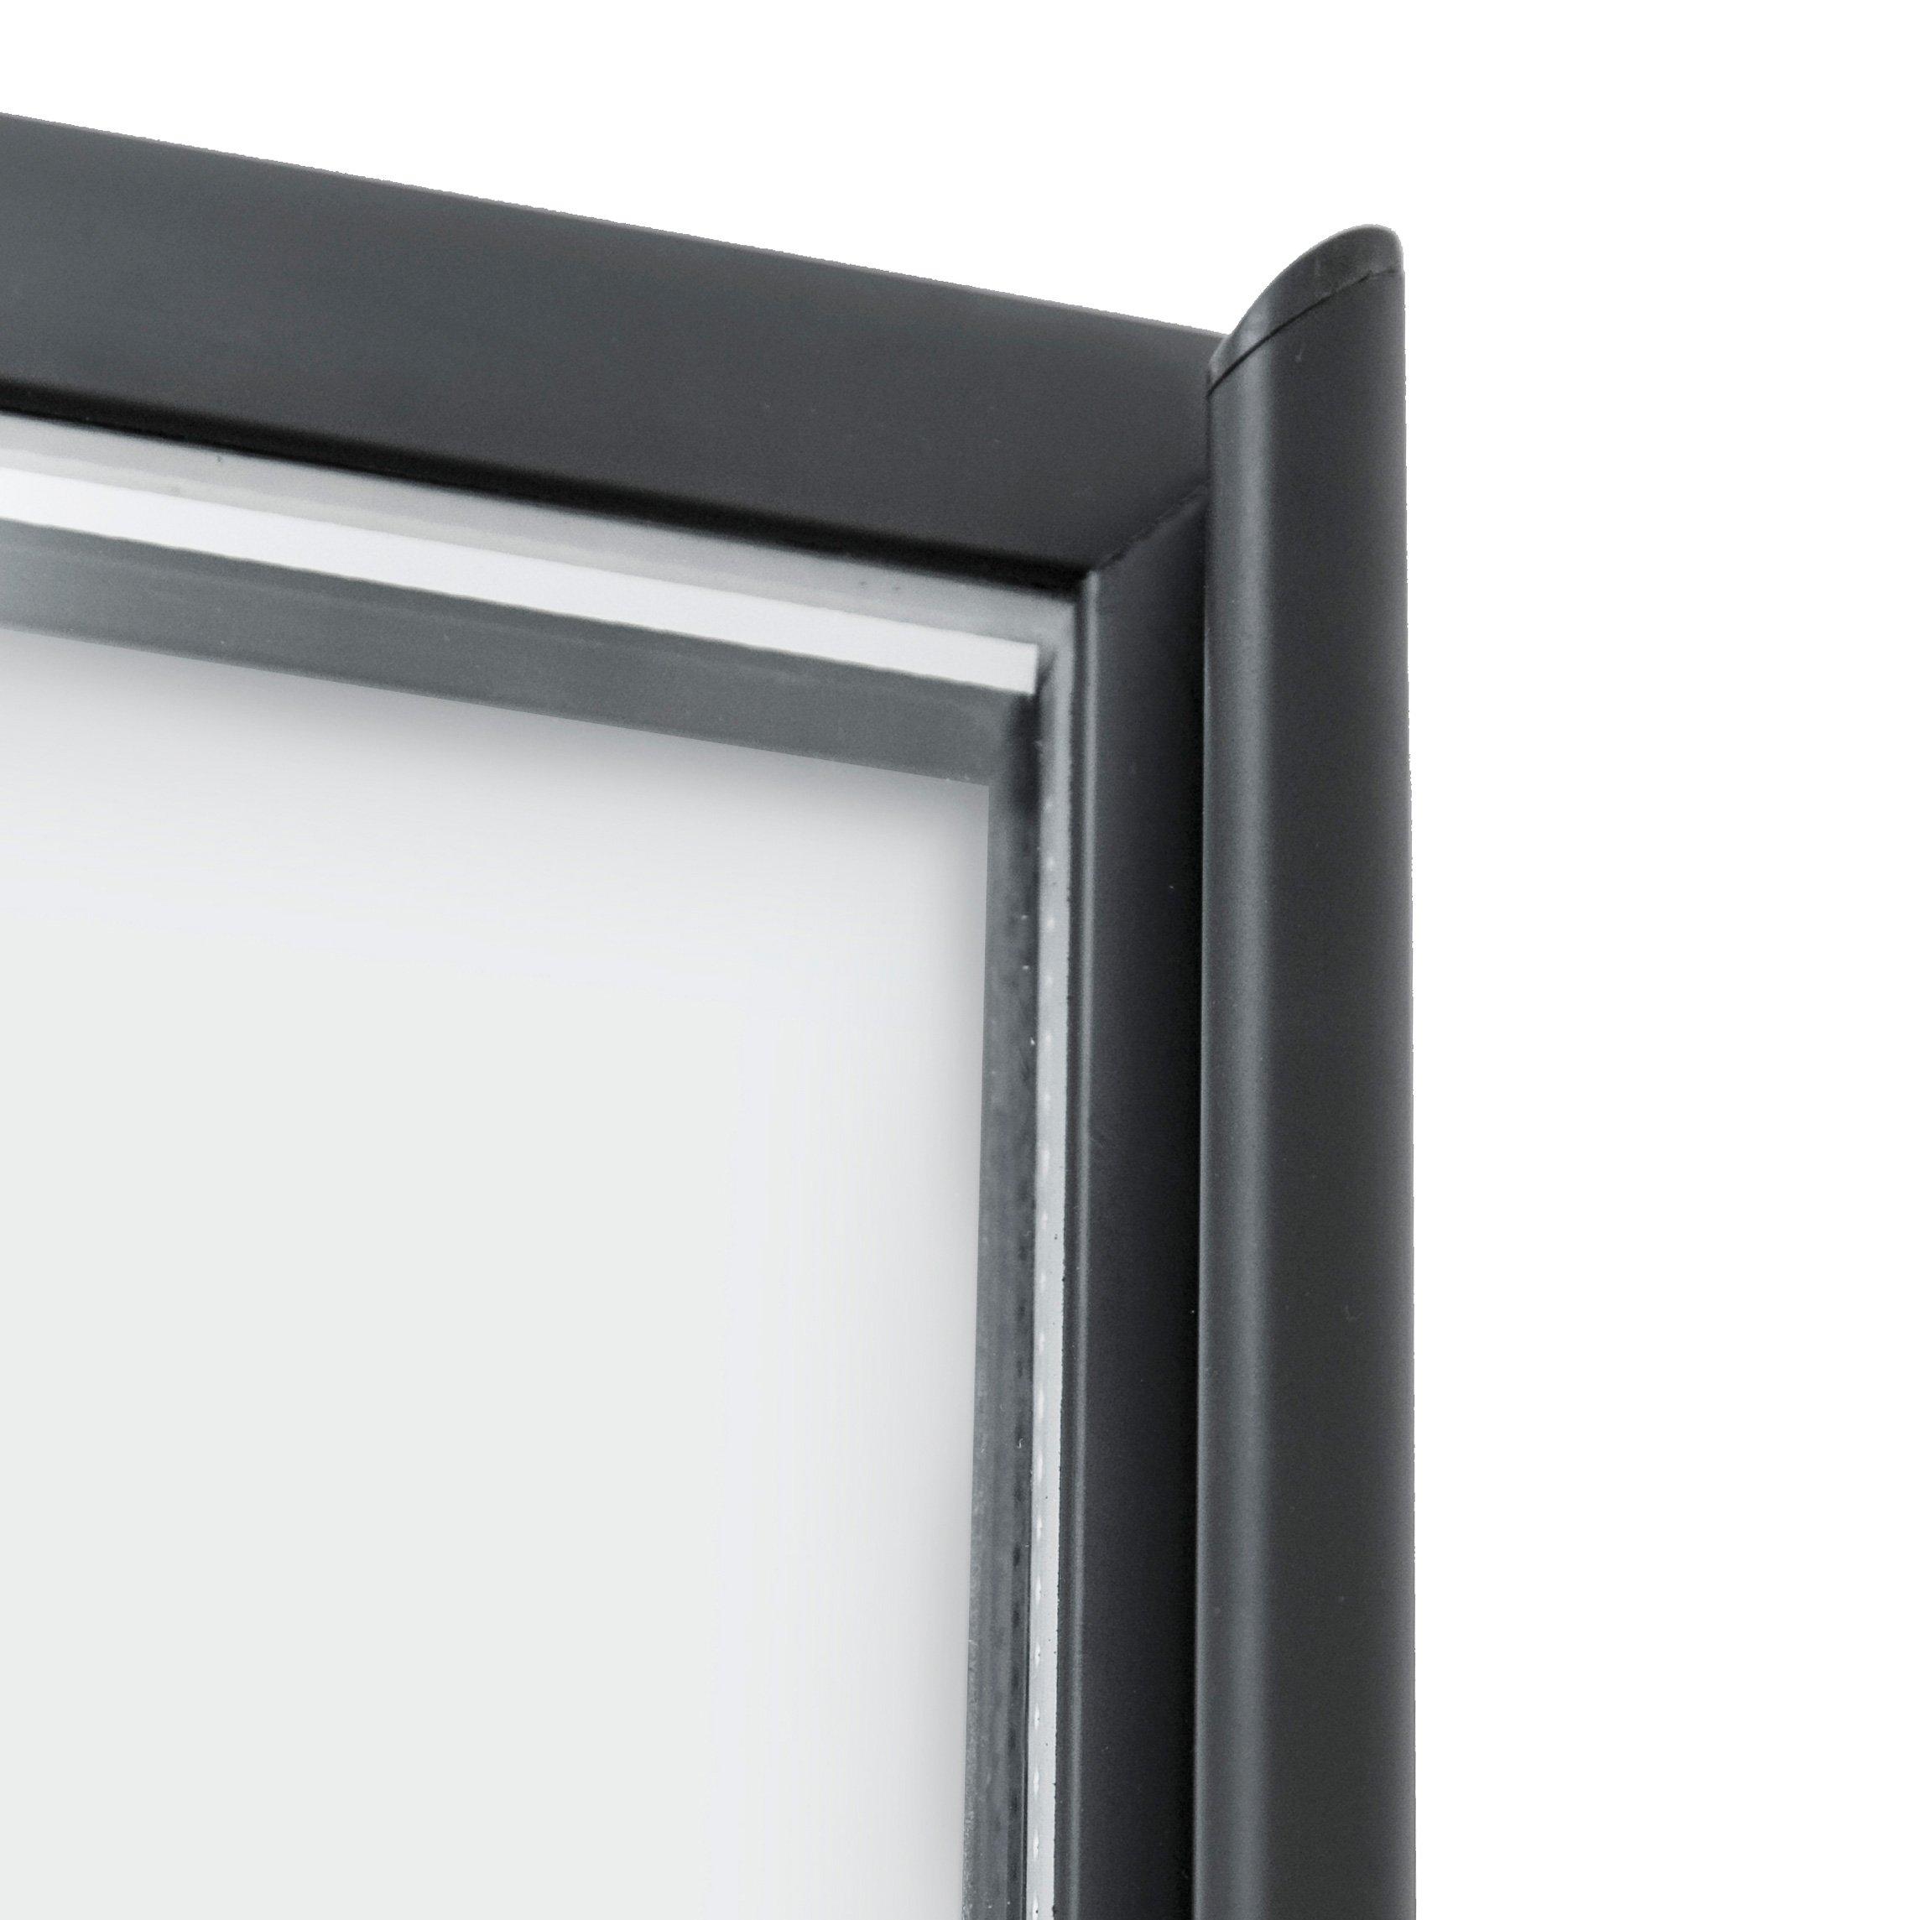 standard-door-angle-square